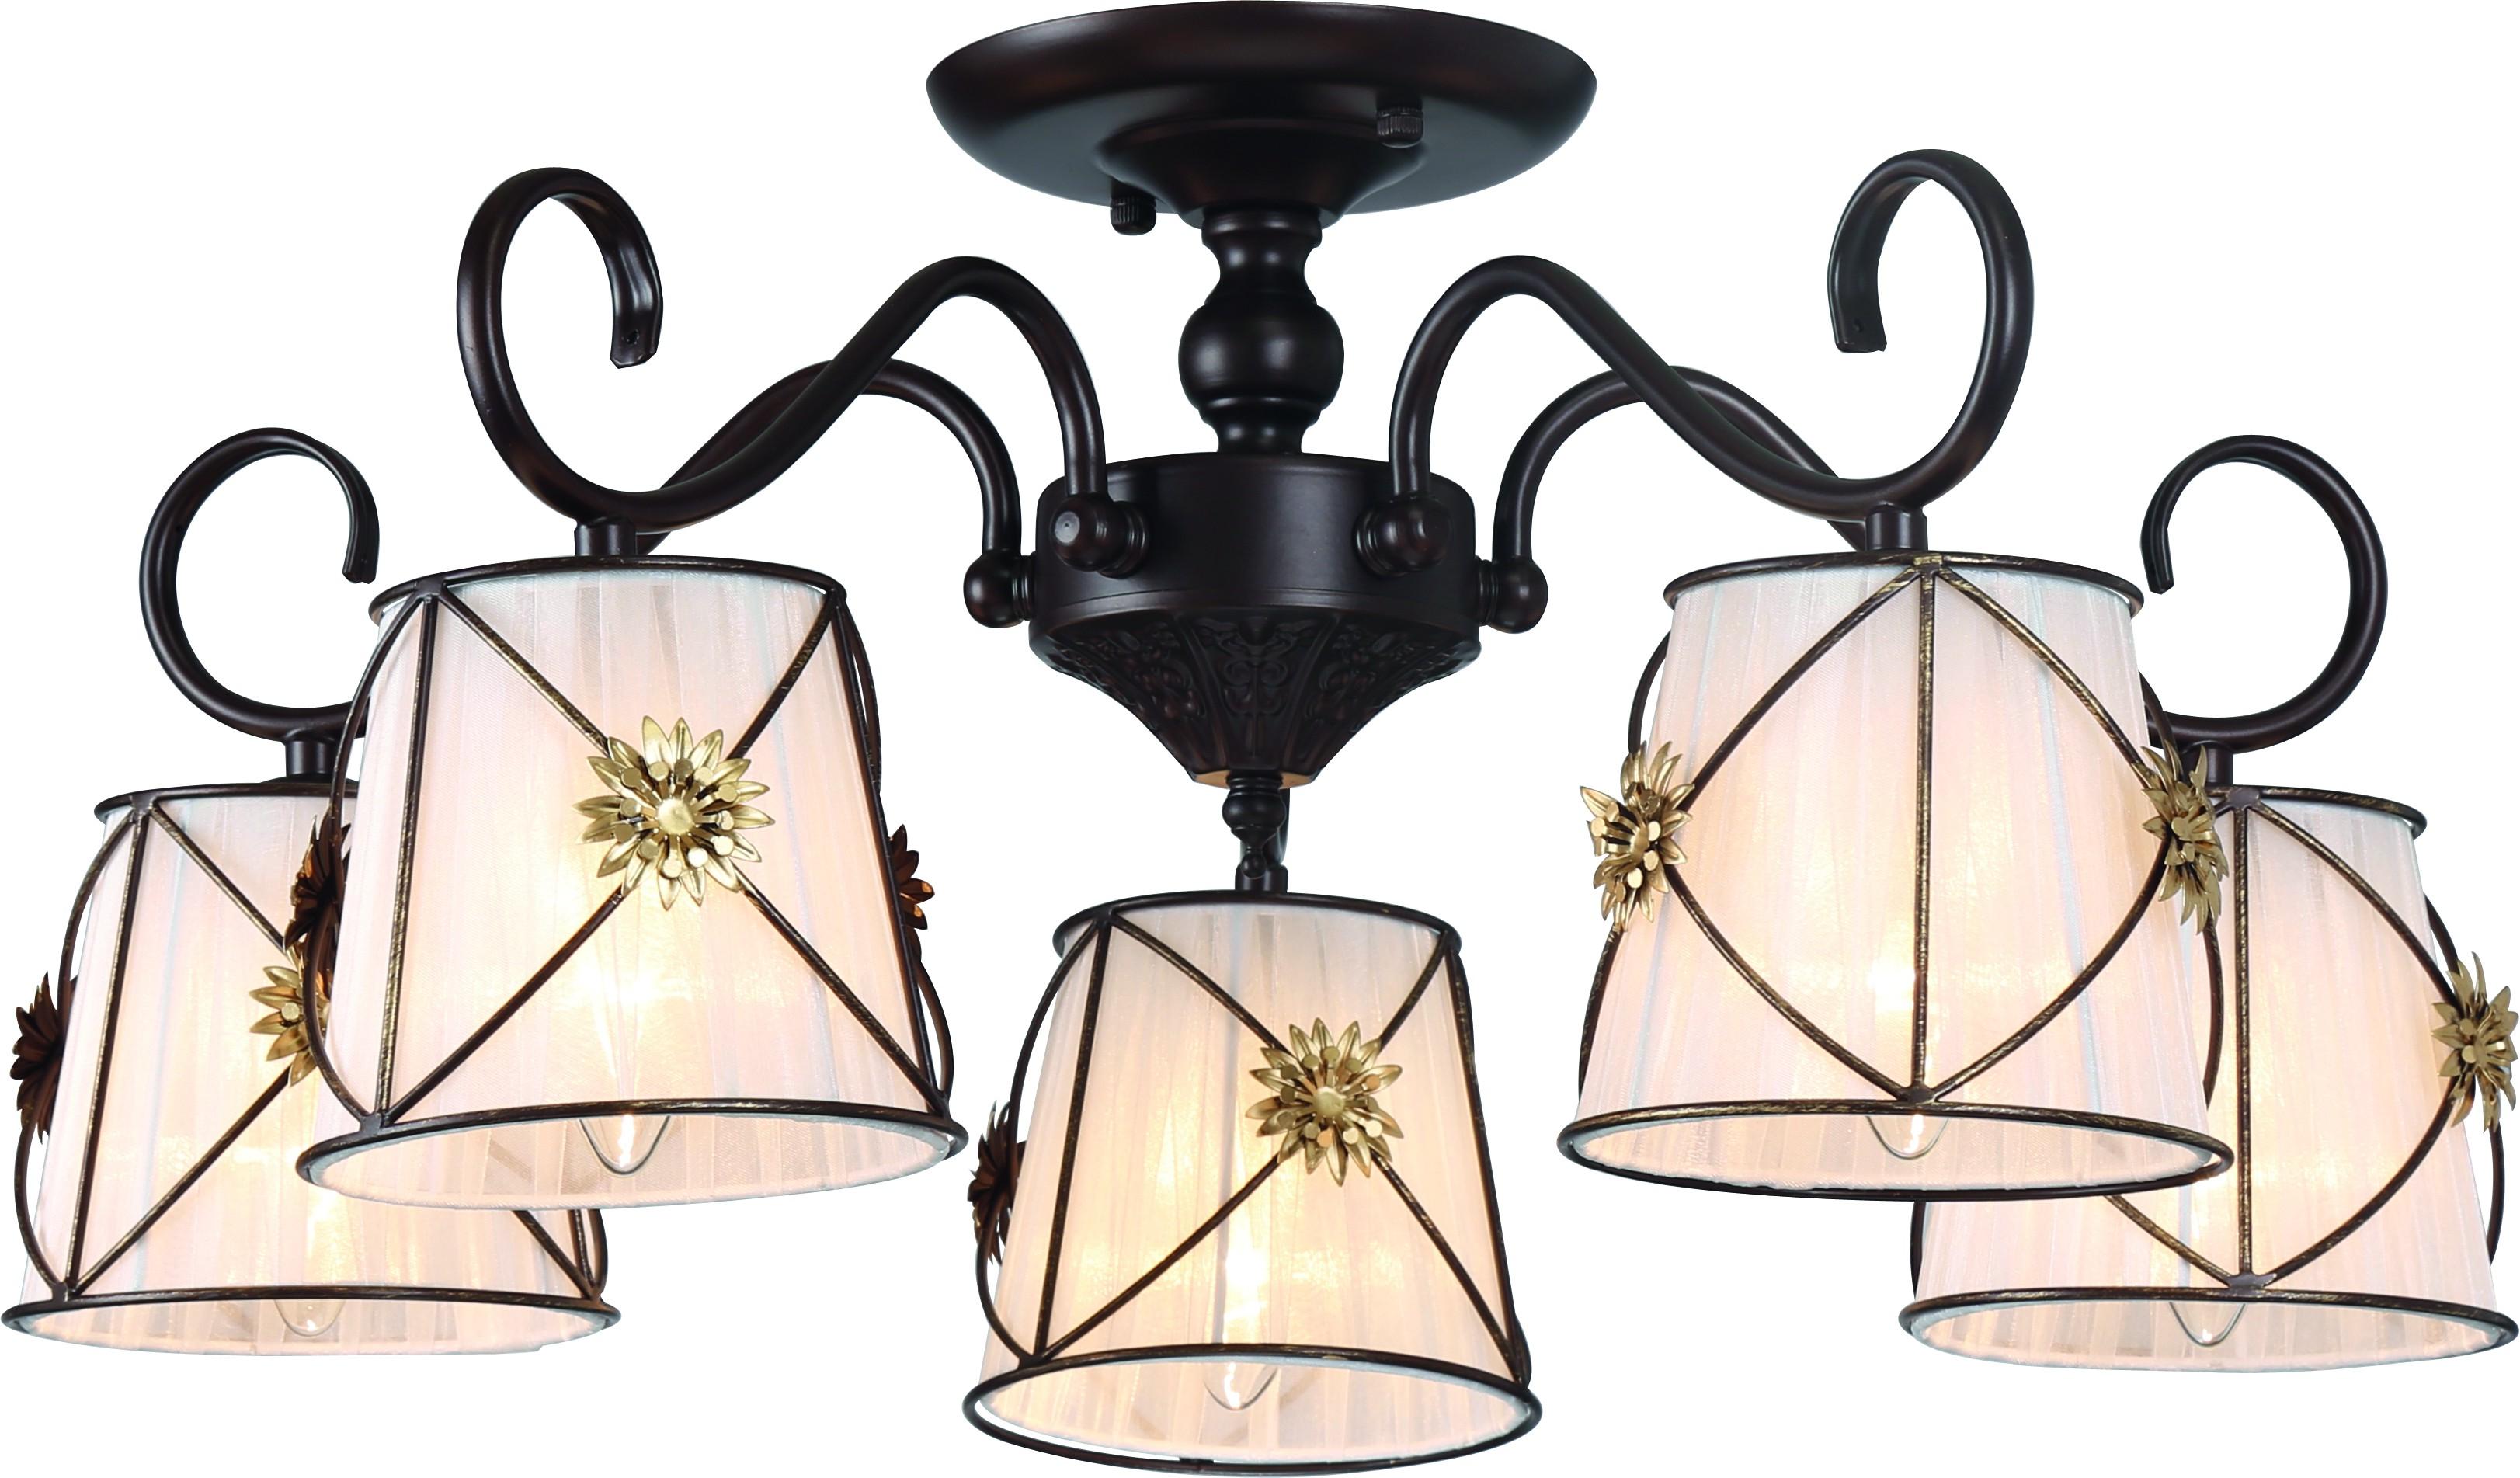 Люстра Arte lamp A5495pl-5br потолочная люстра arte lamp 72 a5495pl 5br